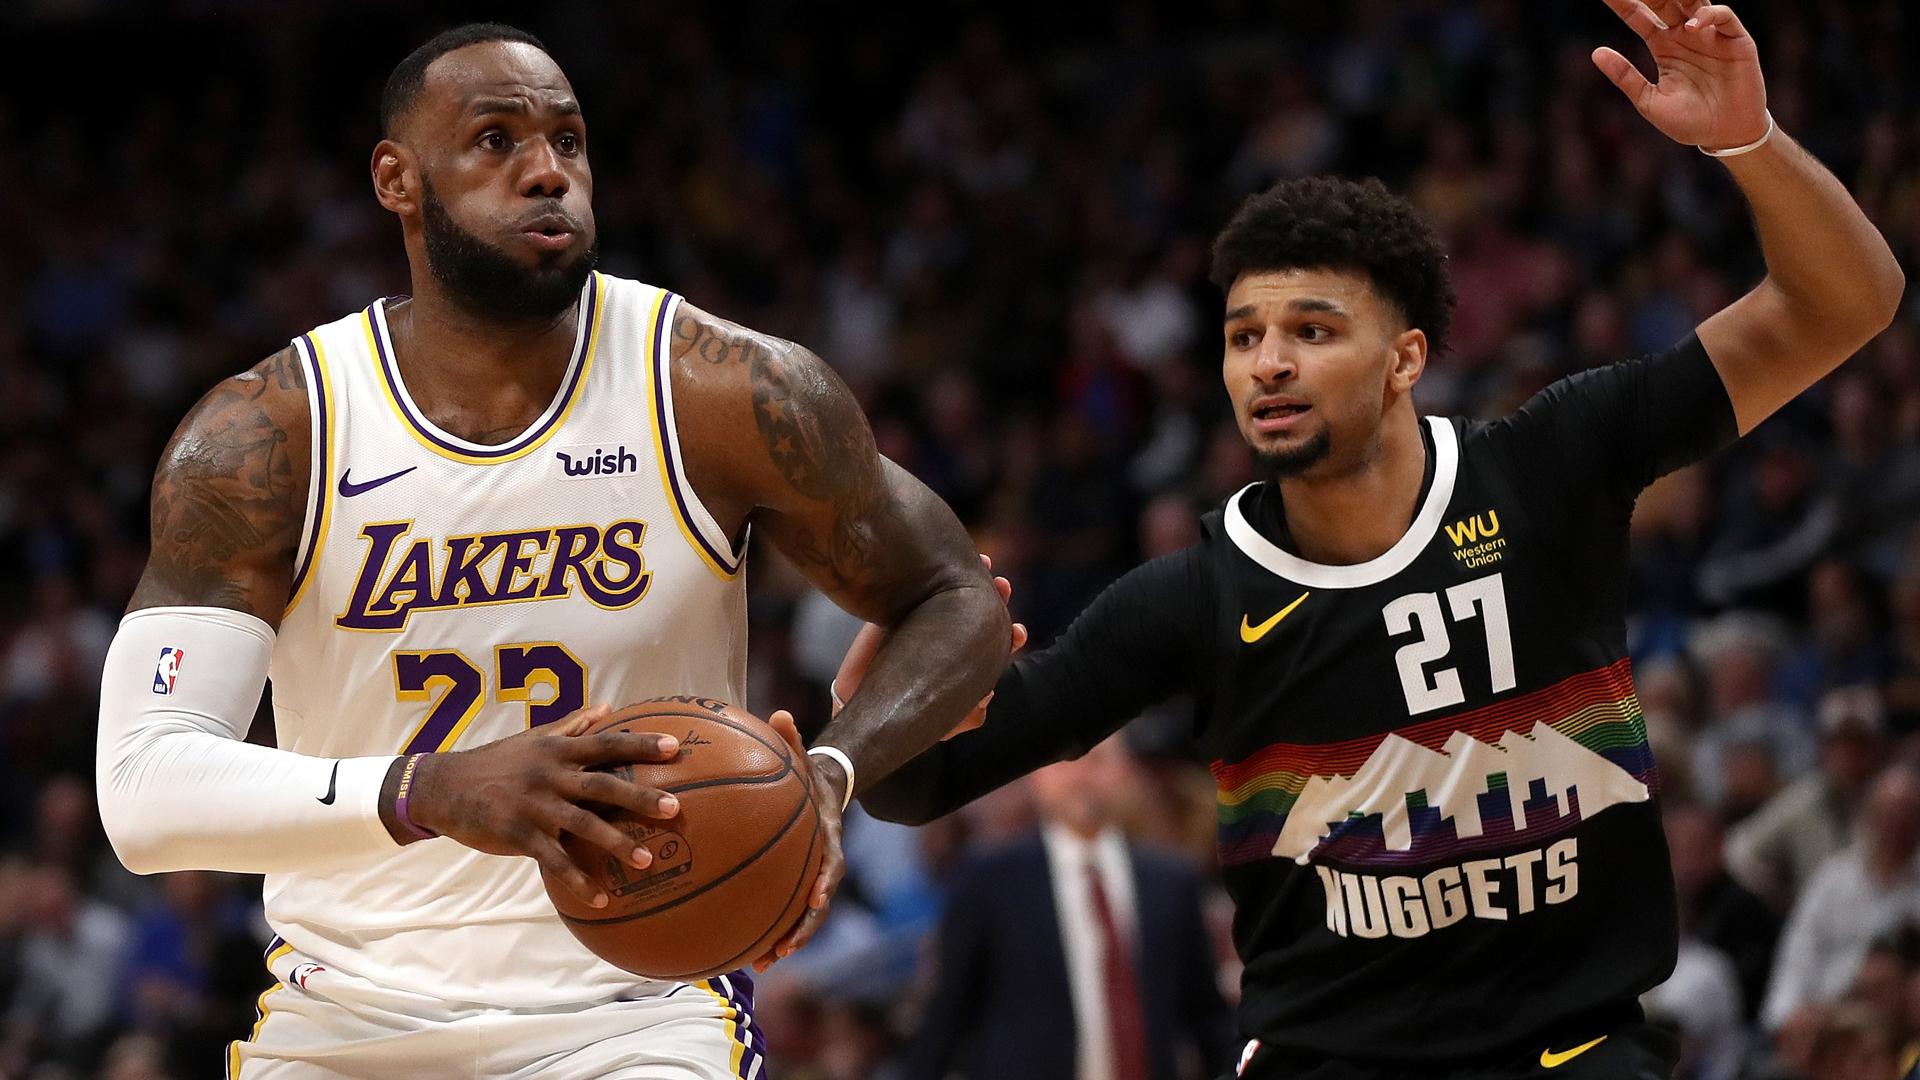 Lakers bounce back, Harden scores 50 in Rockets' loss